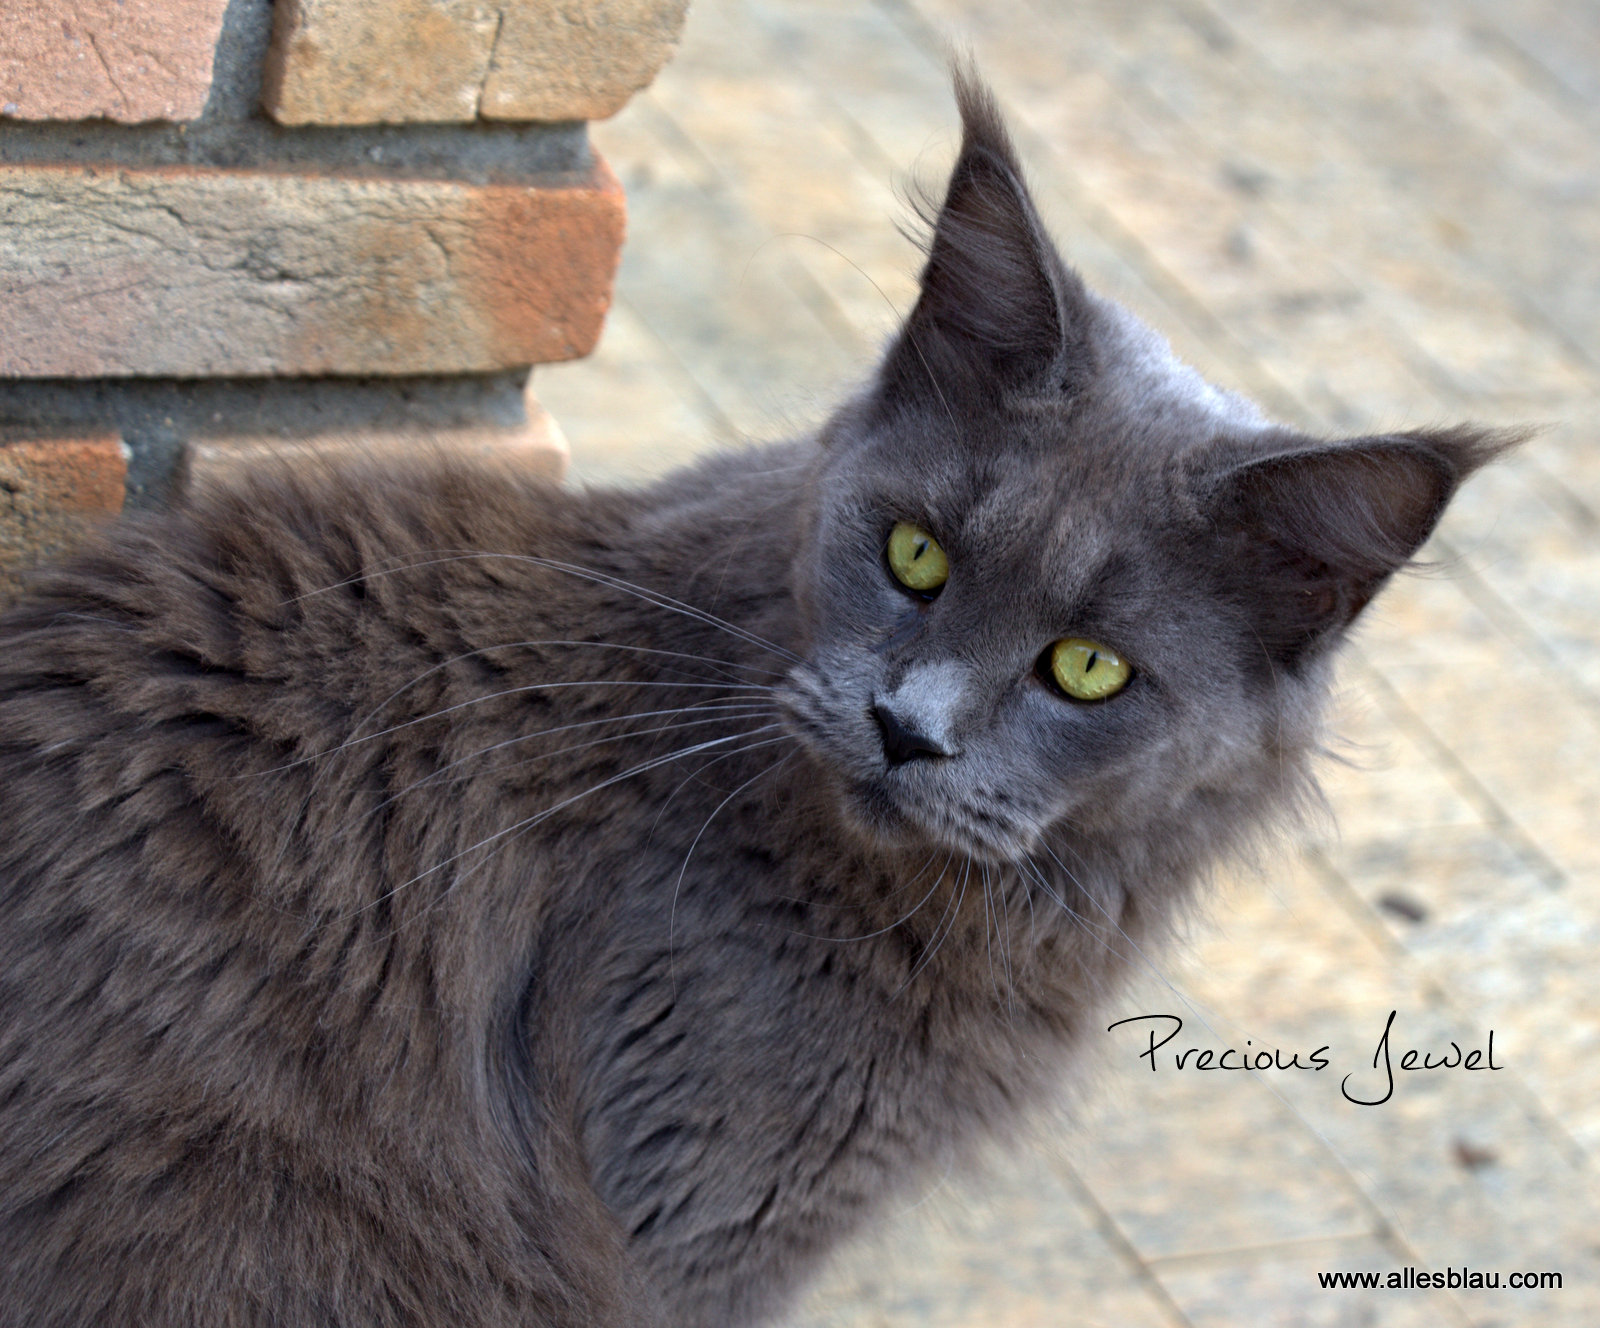 NL*Timaracoon's Precious Jewel